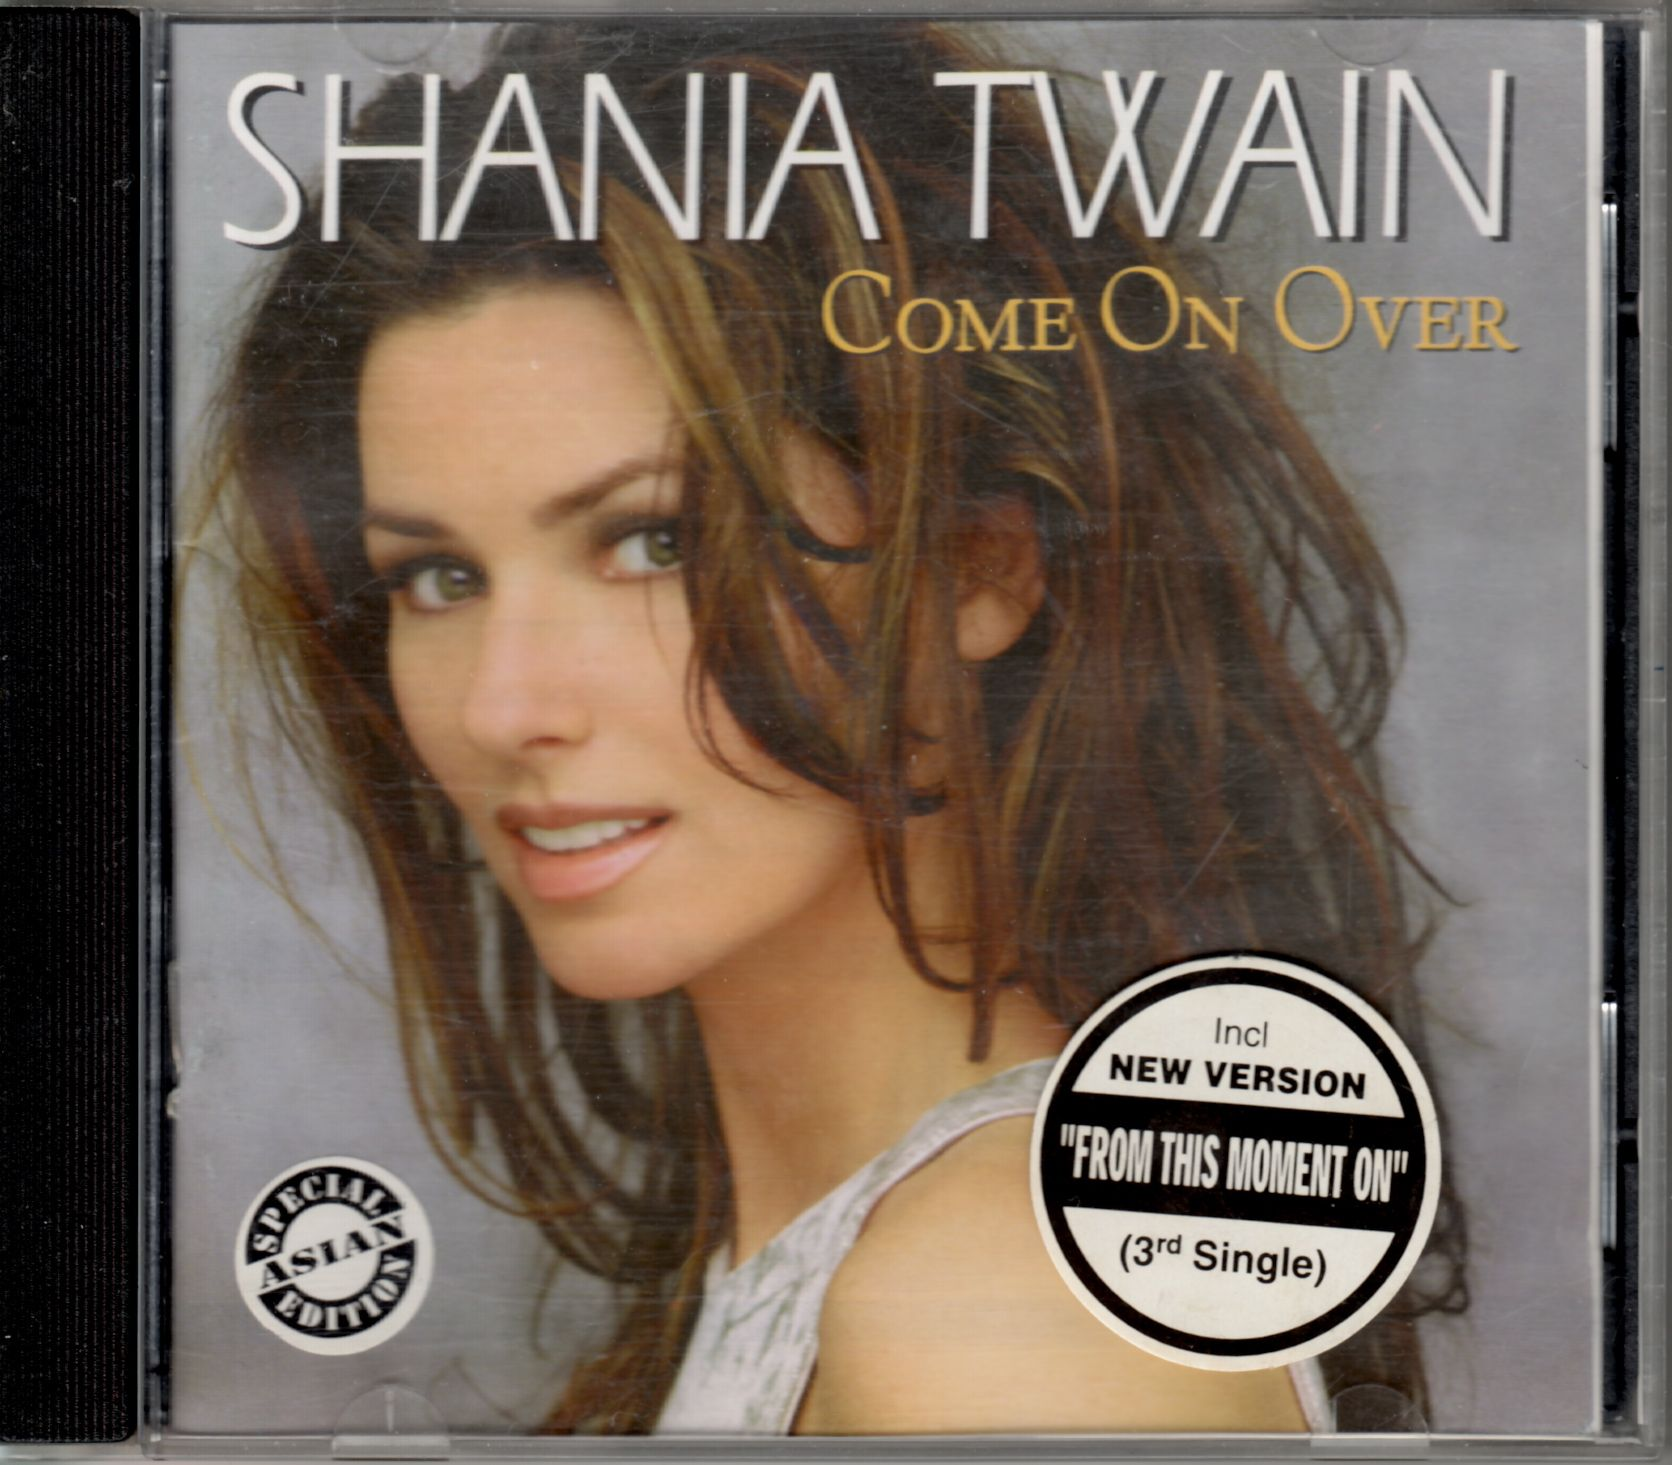 shania-twain-came-lesbian